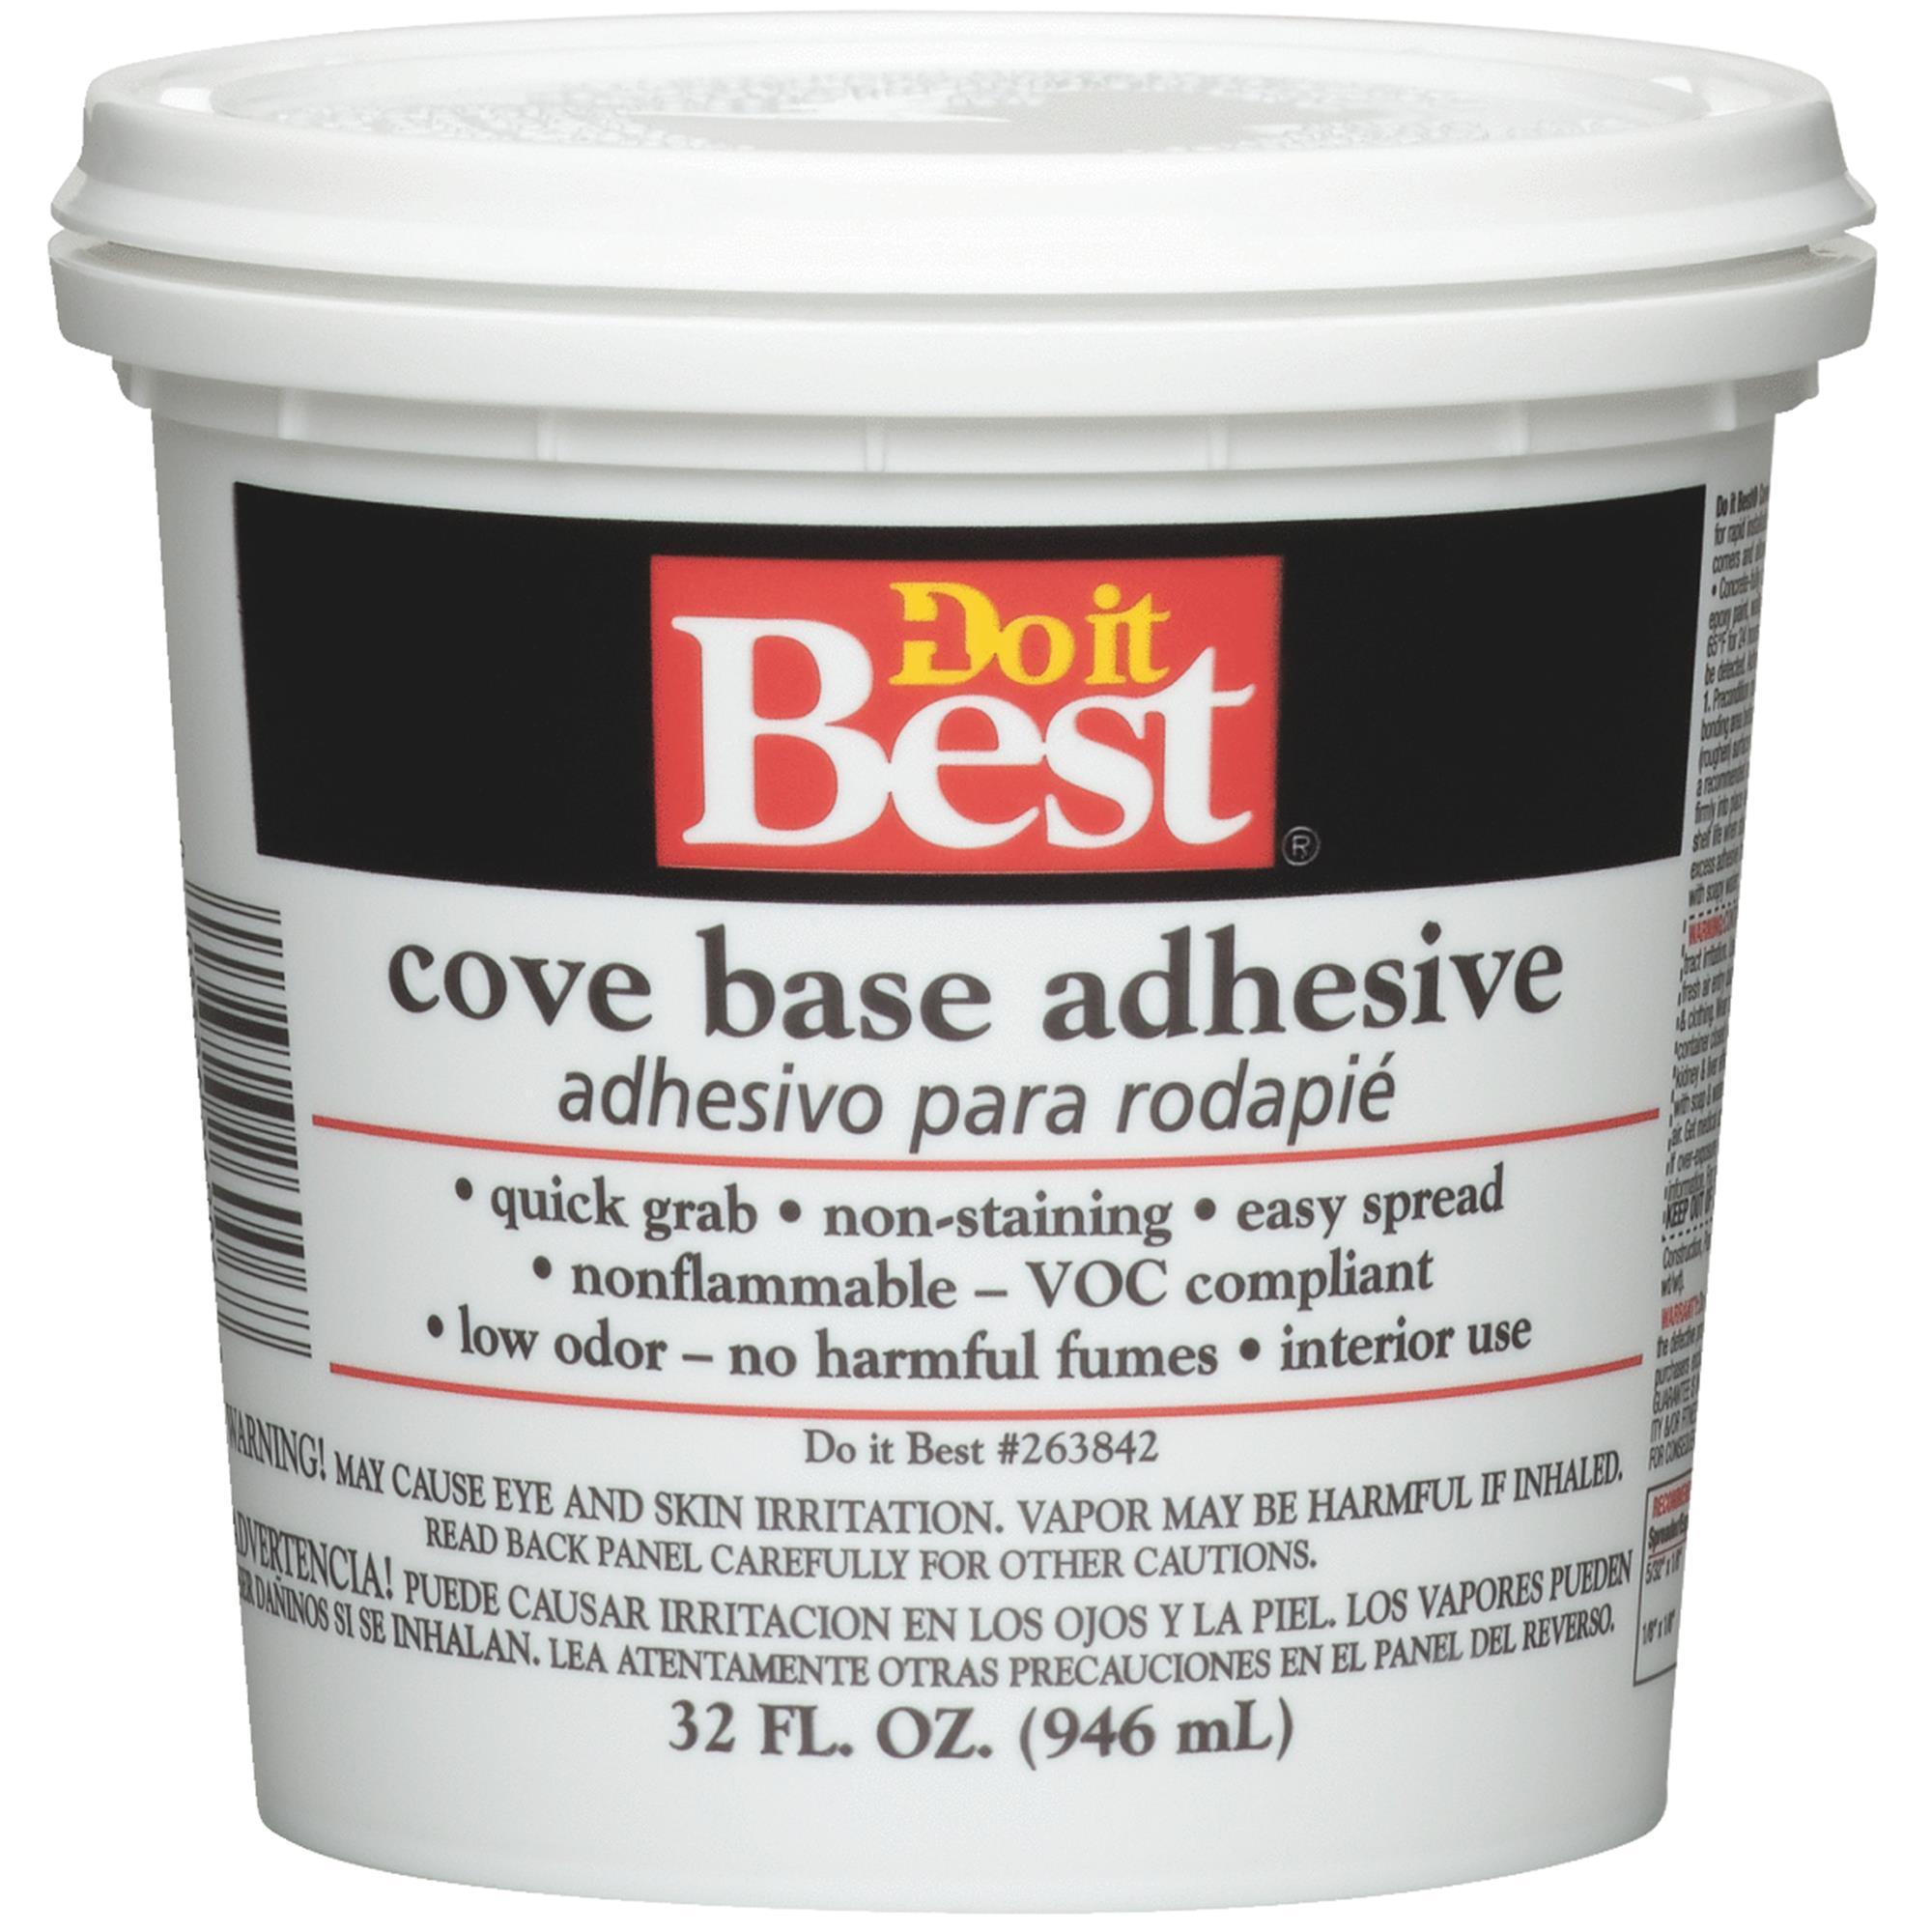 Do it Cove Base Adhesive